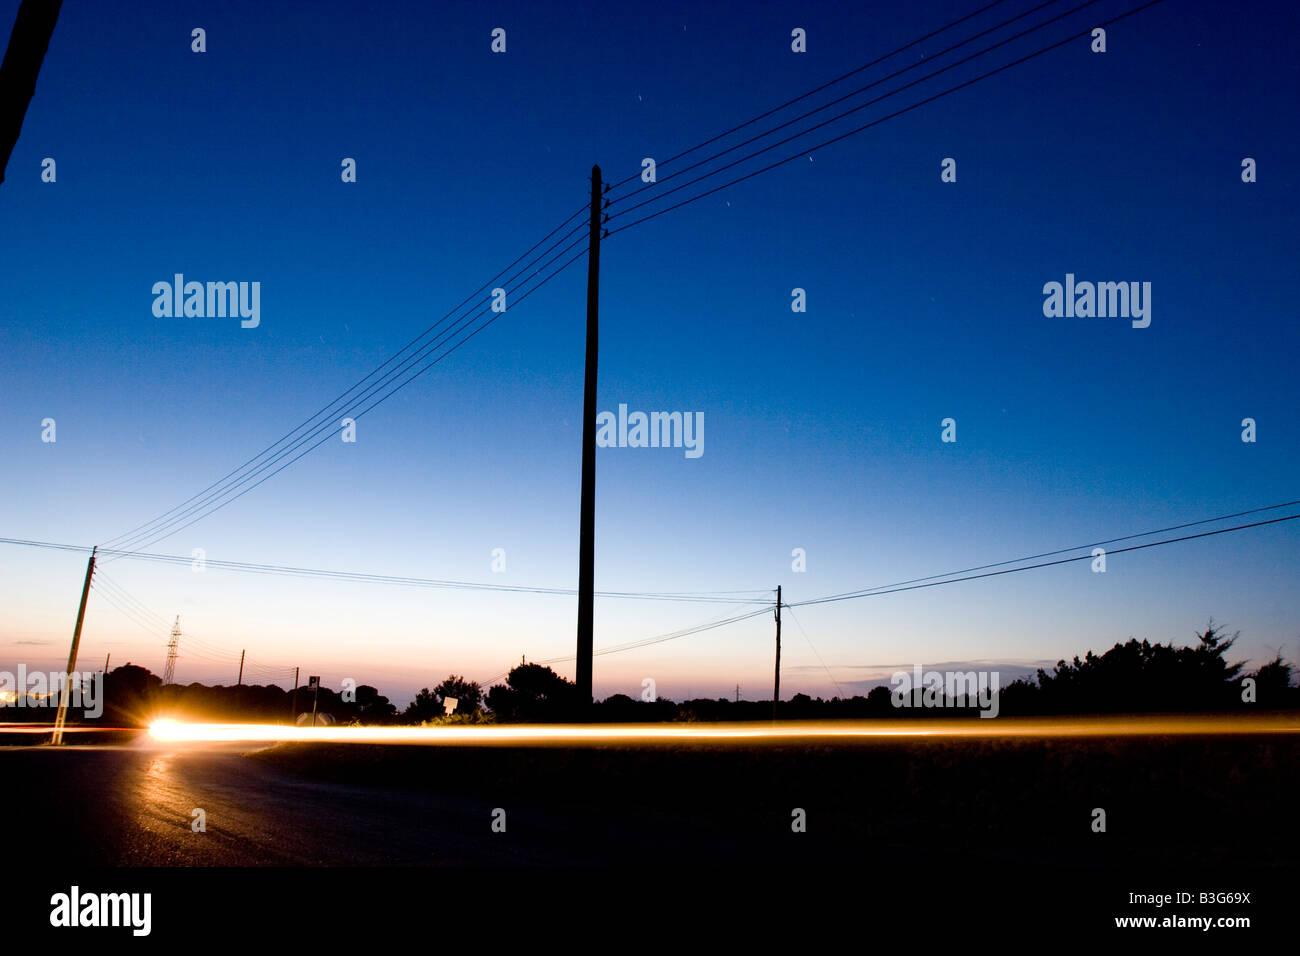 Ray of a motorbike  light at sunset, Formentera - Stock Image